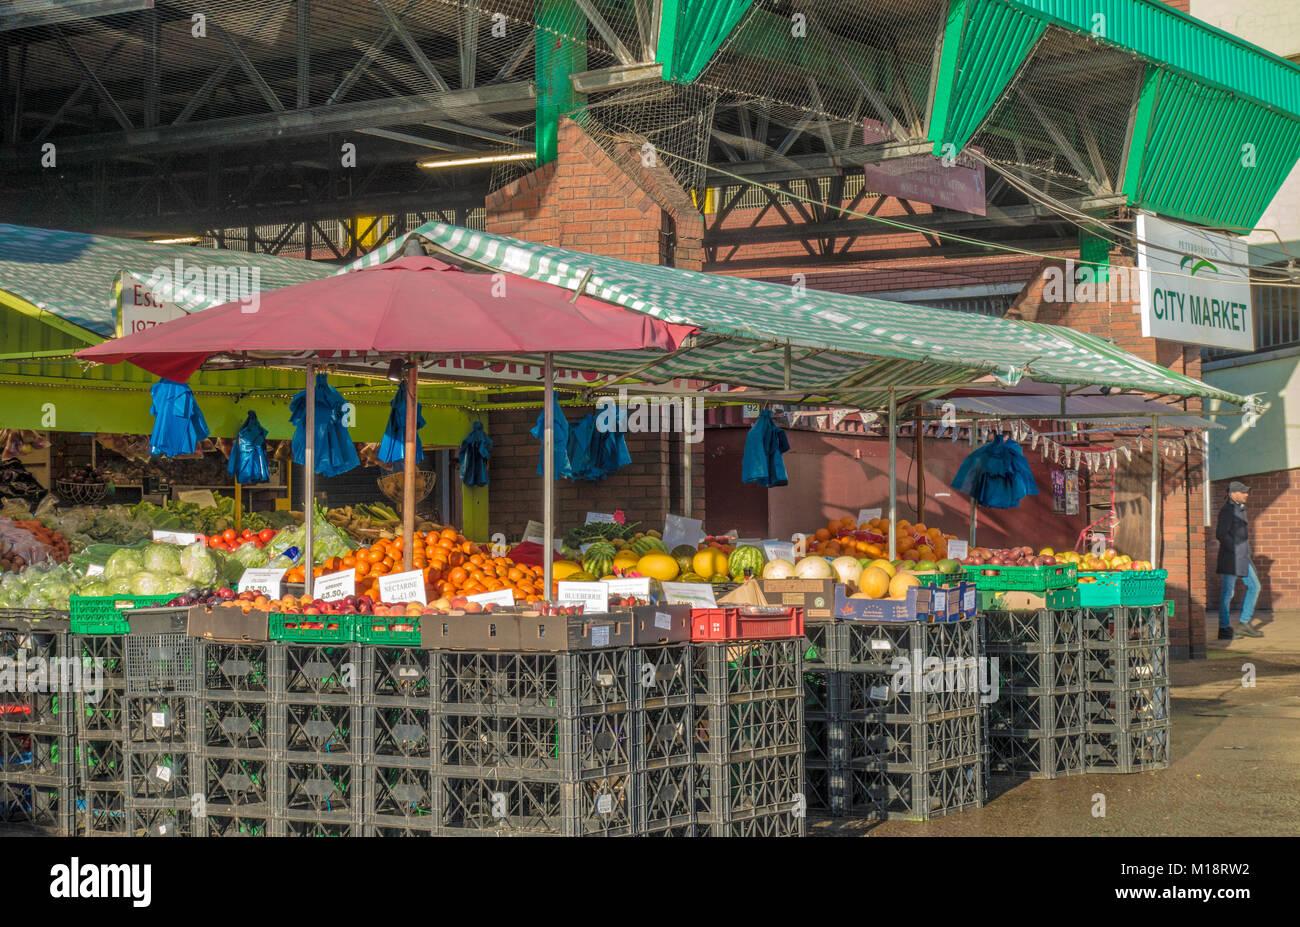 M M Food Market Peterborough On